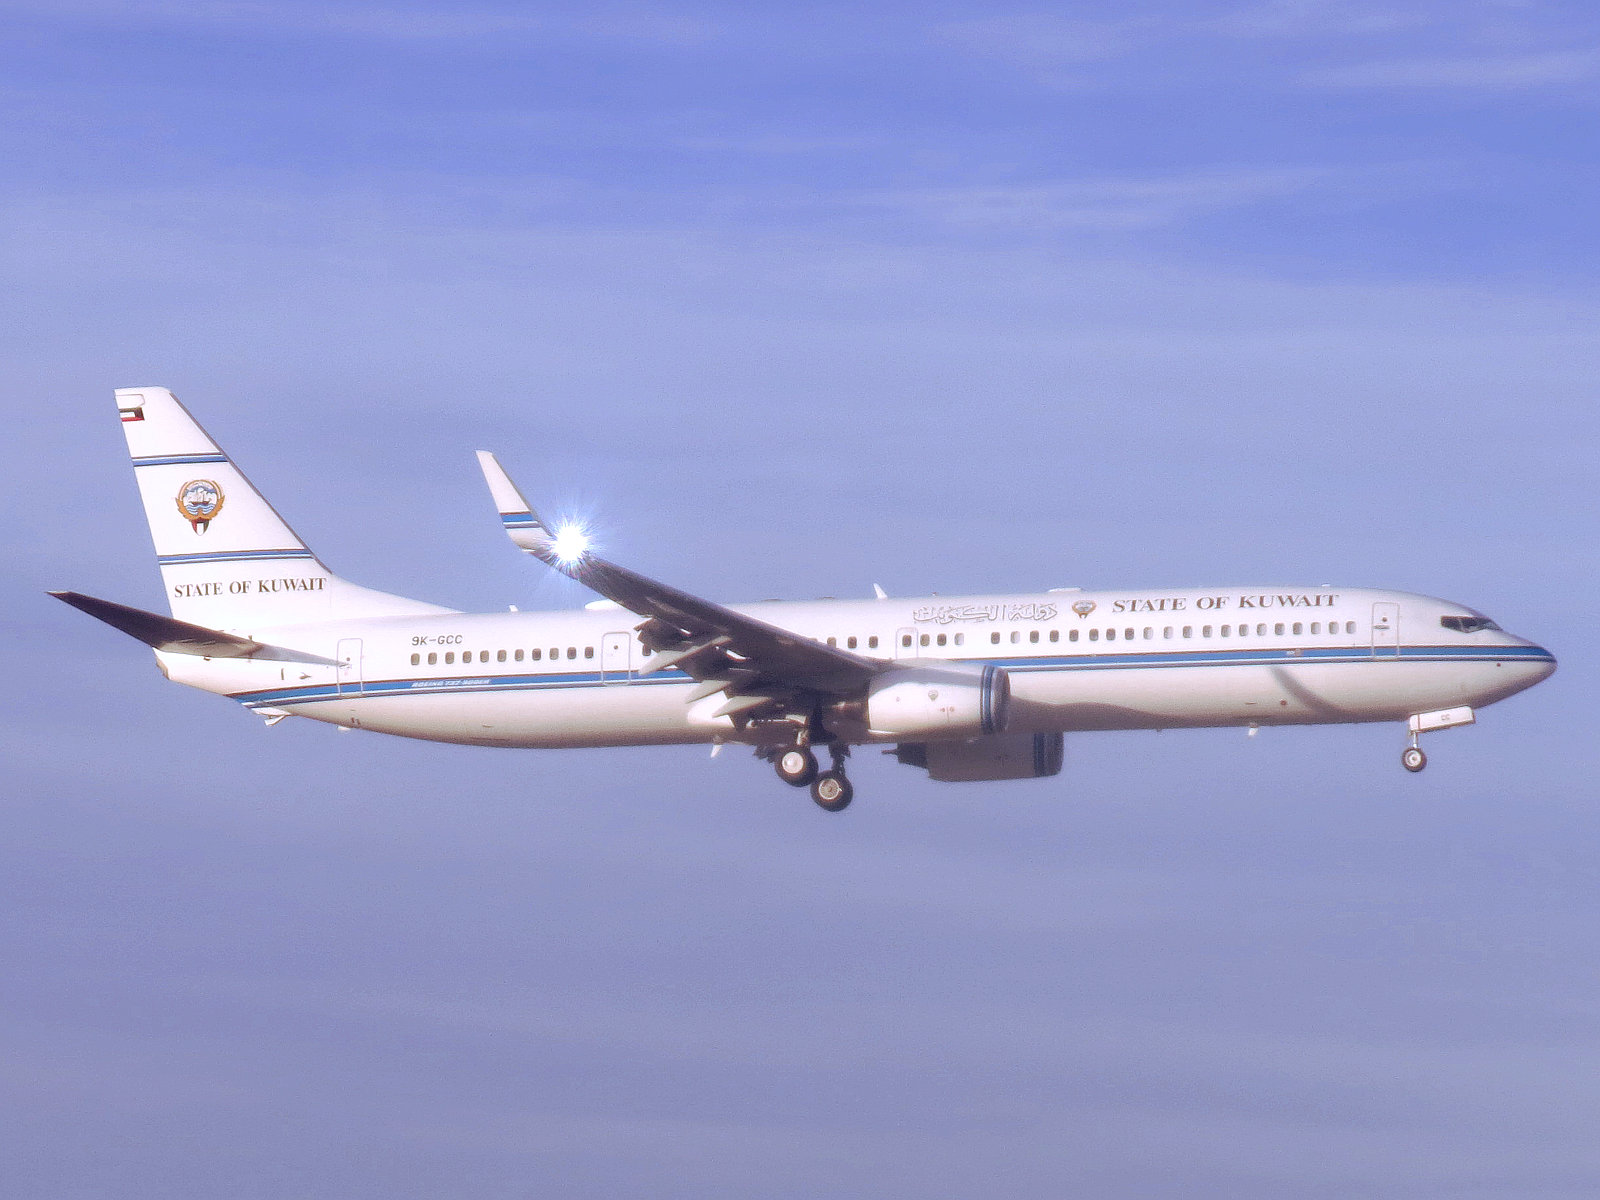 File:State of Kuwait Boeing 737-9BQ(ER) (Boeing Business Jet